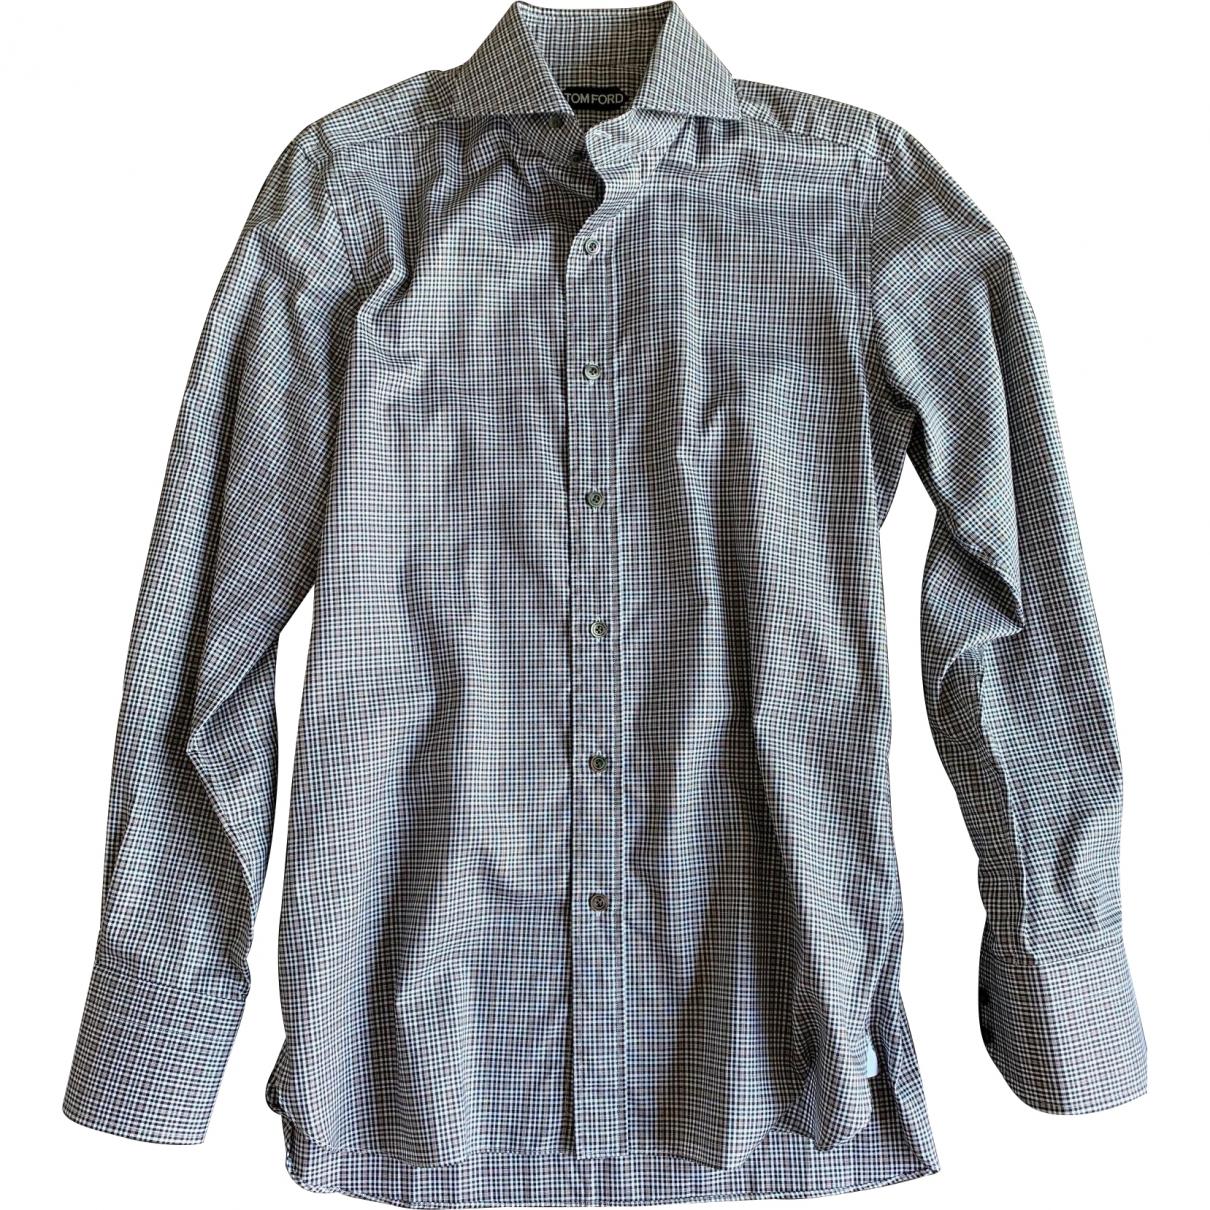 Tom Ford \N Multicolour Cotton Shirts for Men 40 EU (tour de cou / collar)